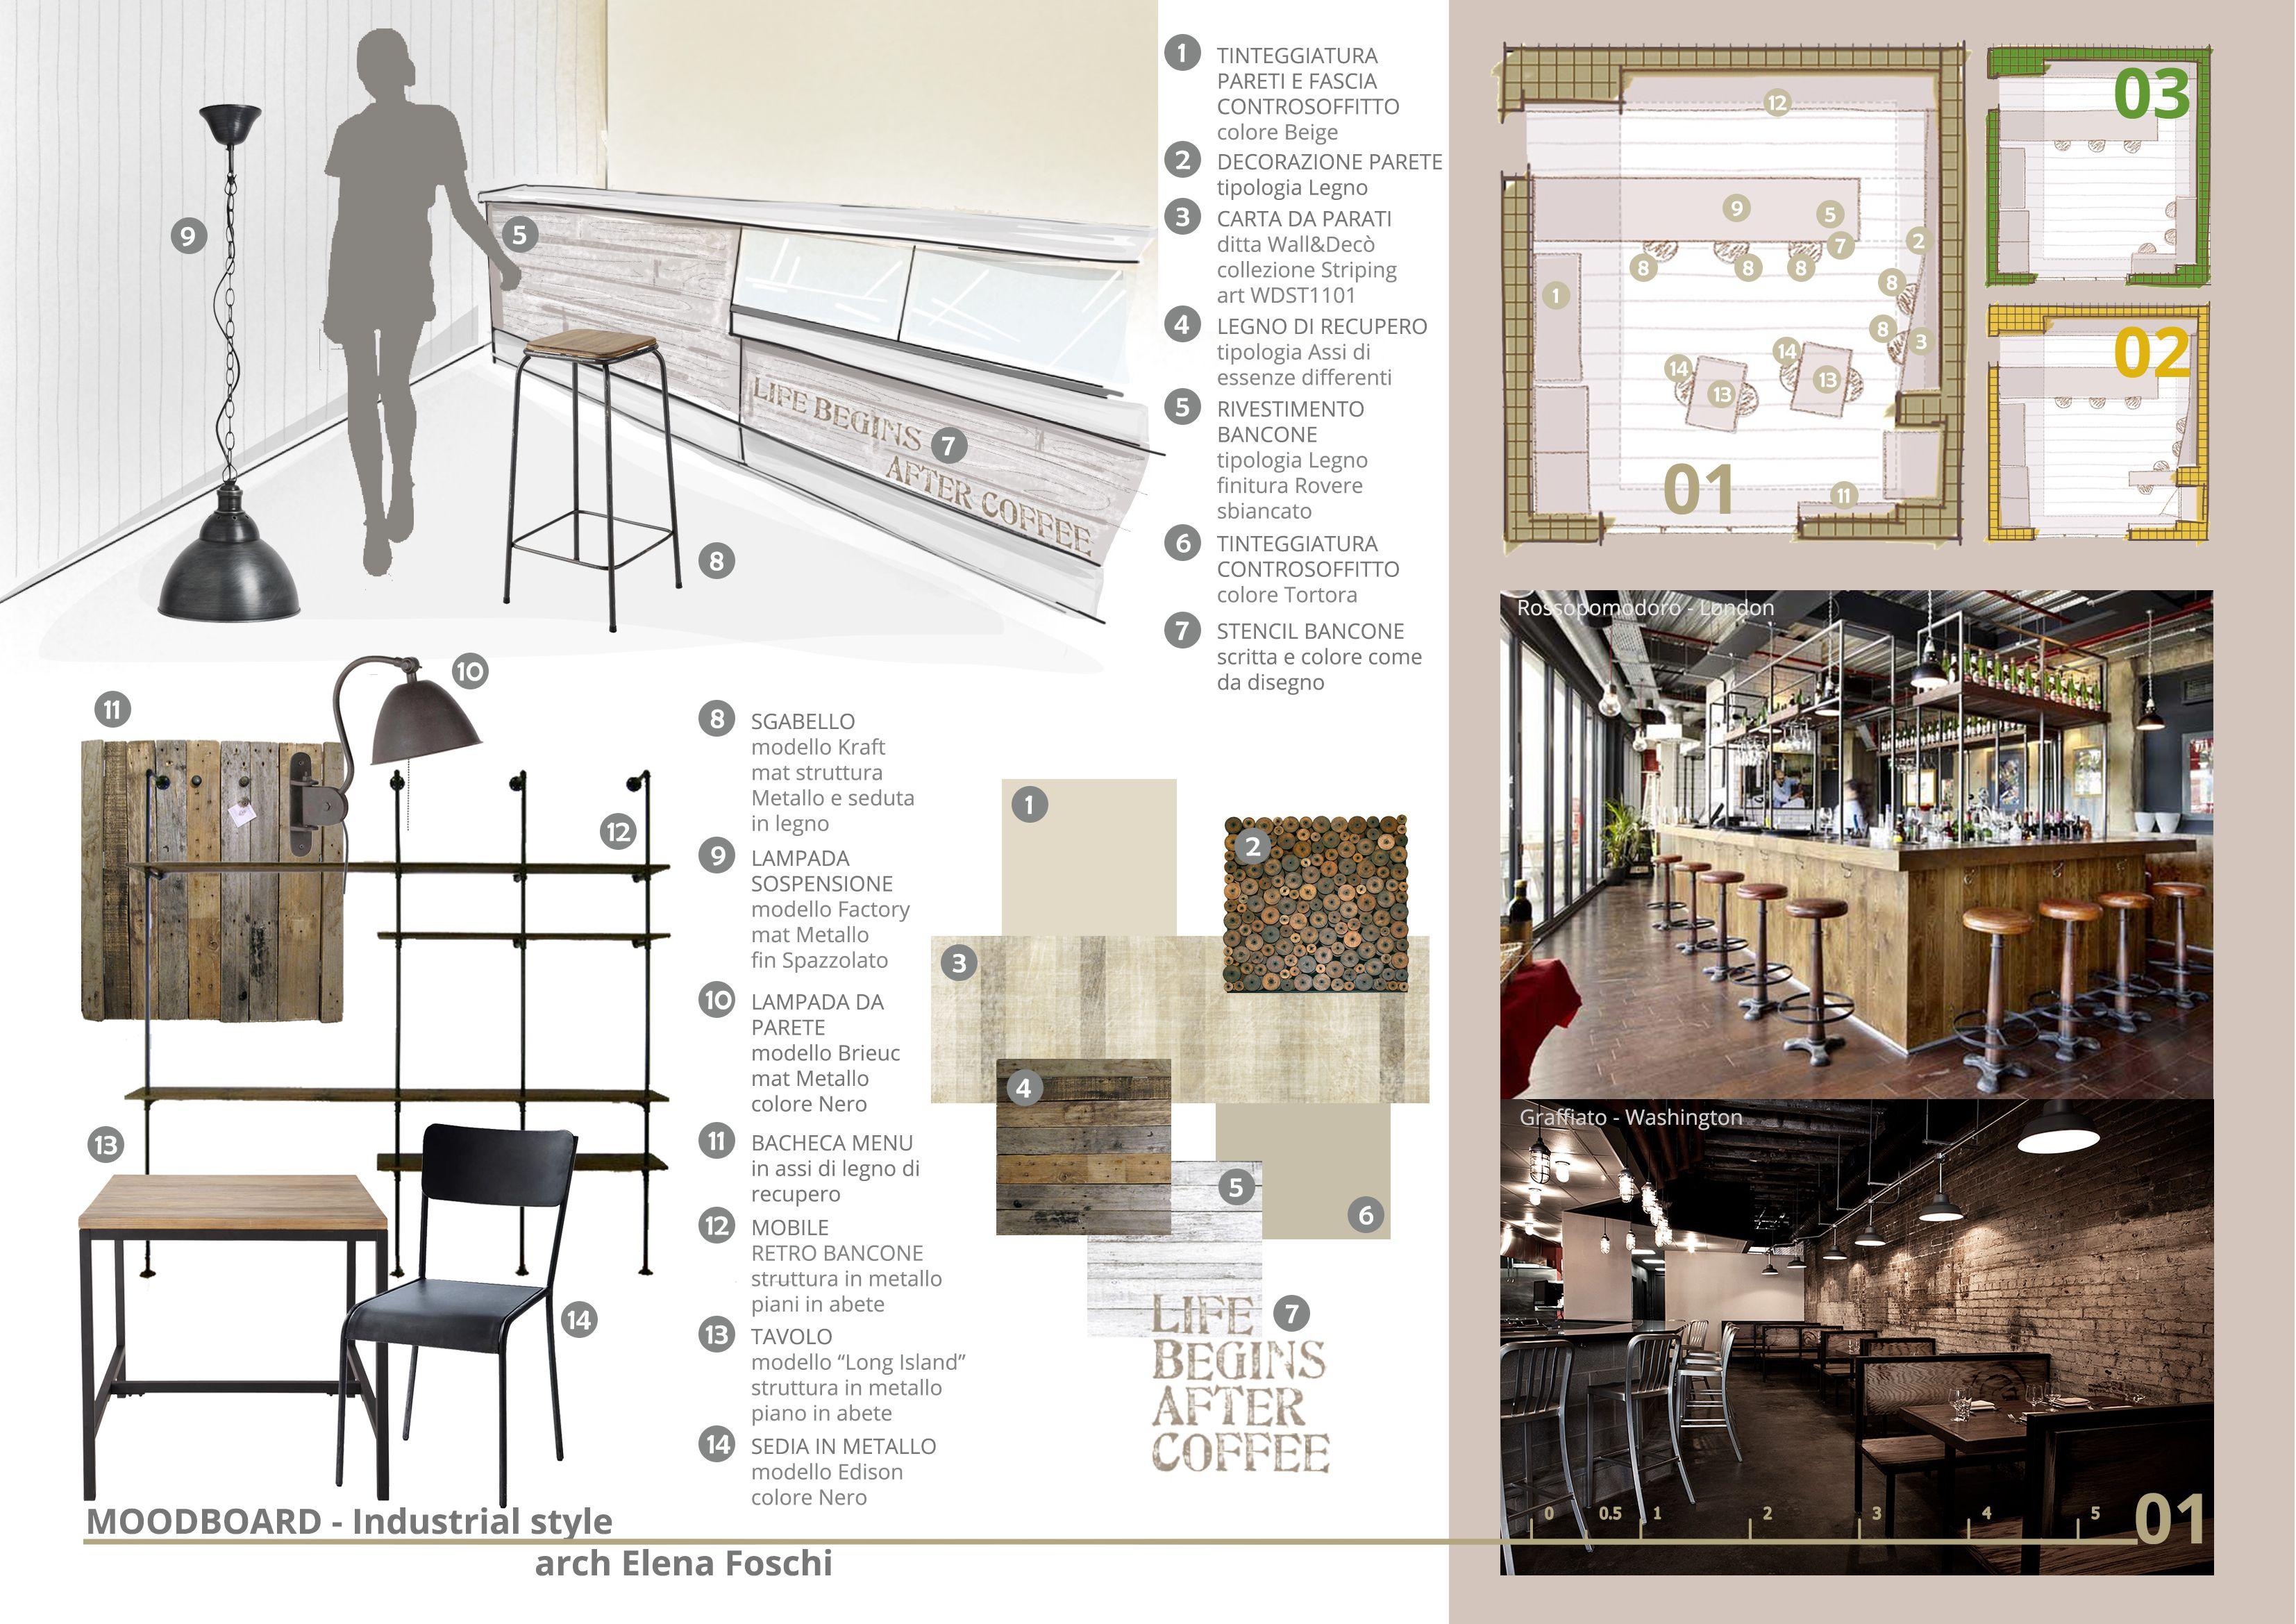 Moodboard restayling bar moodboard efarchitettura for Riviste di interior design